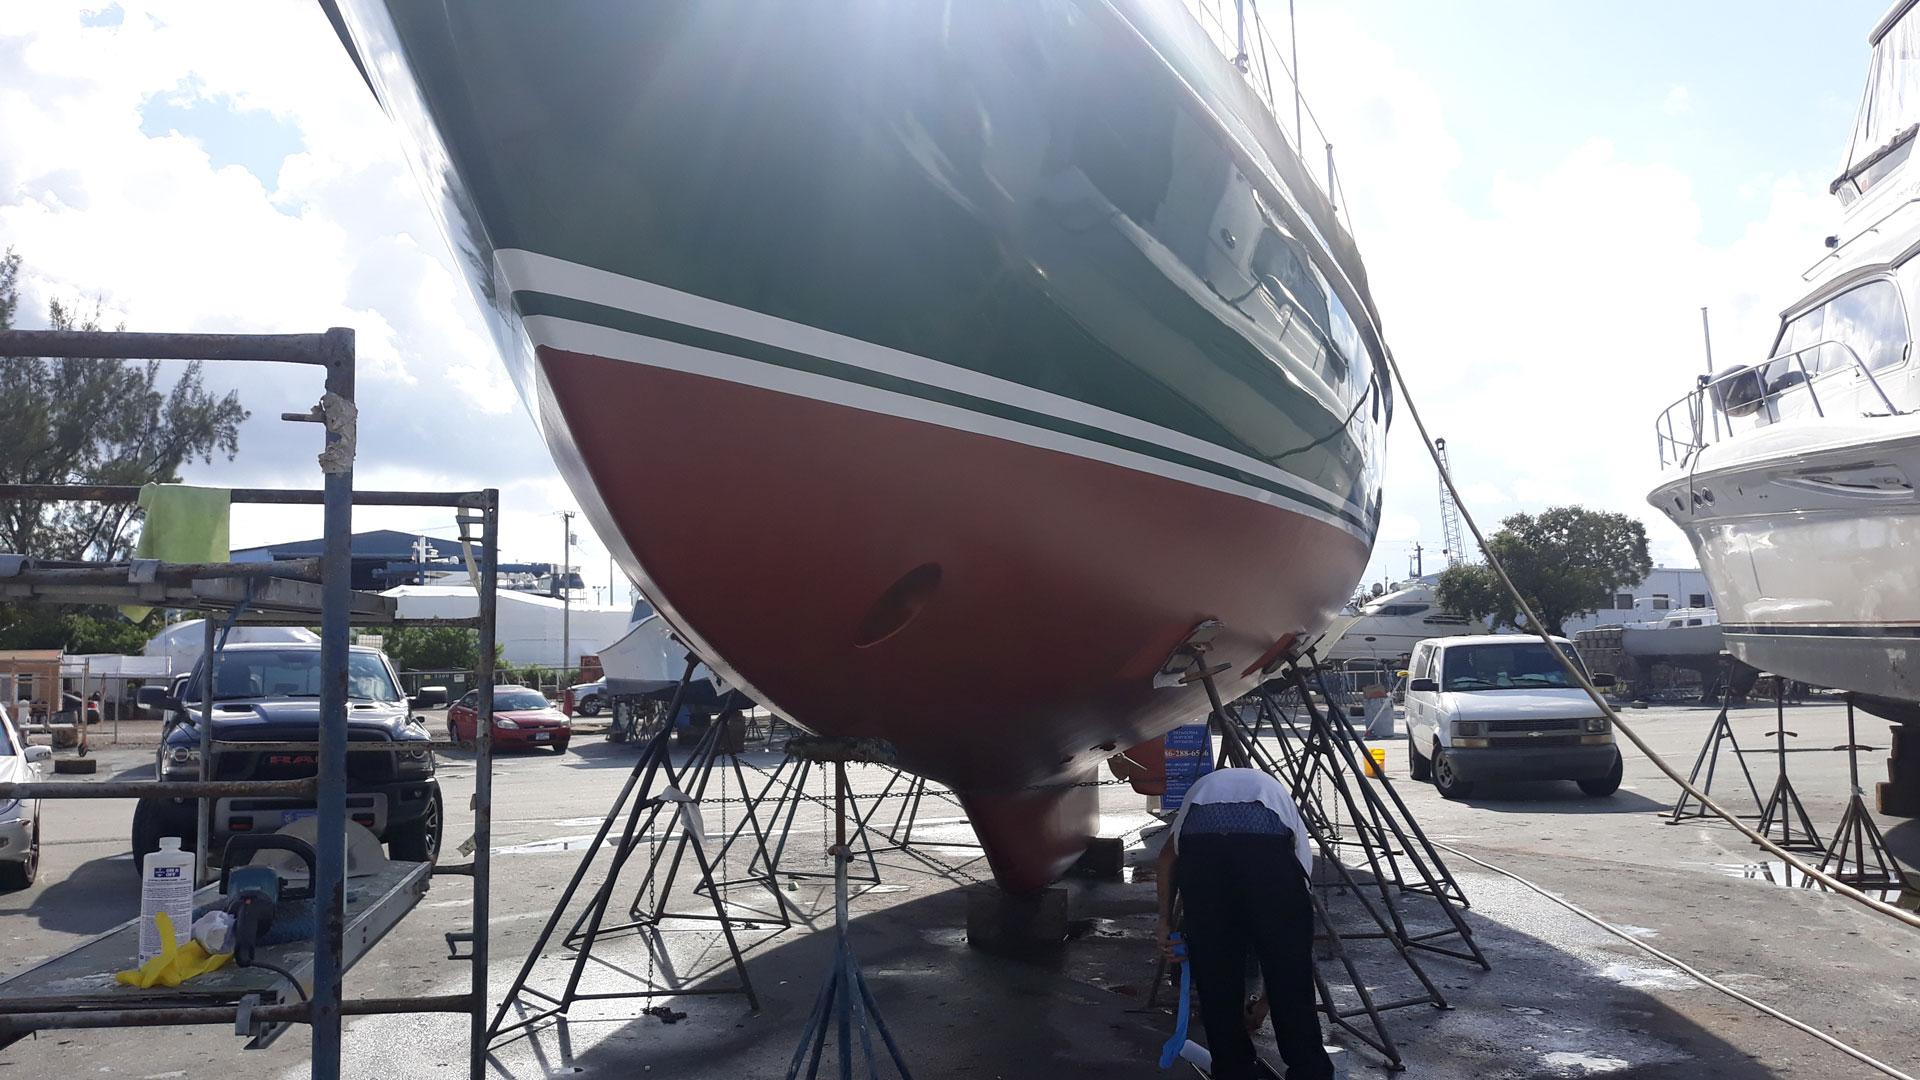 Fiberglass Repair in North Miami Beach, Fort Lauderdale, Pompano Beach